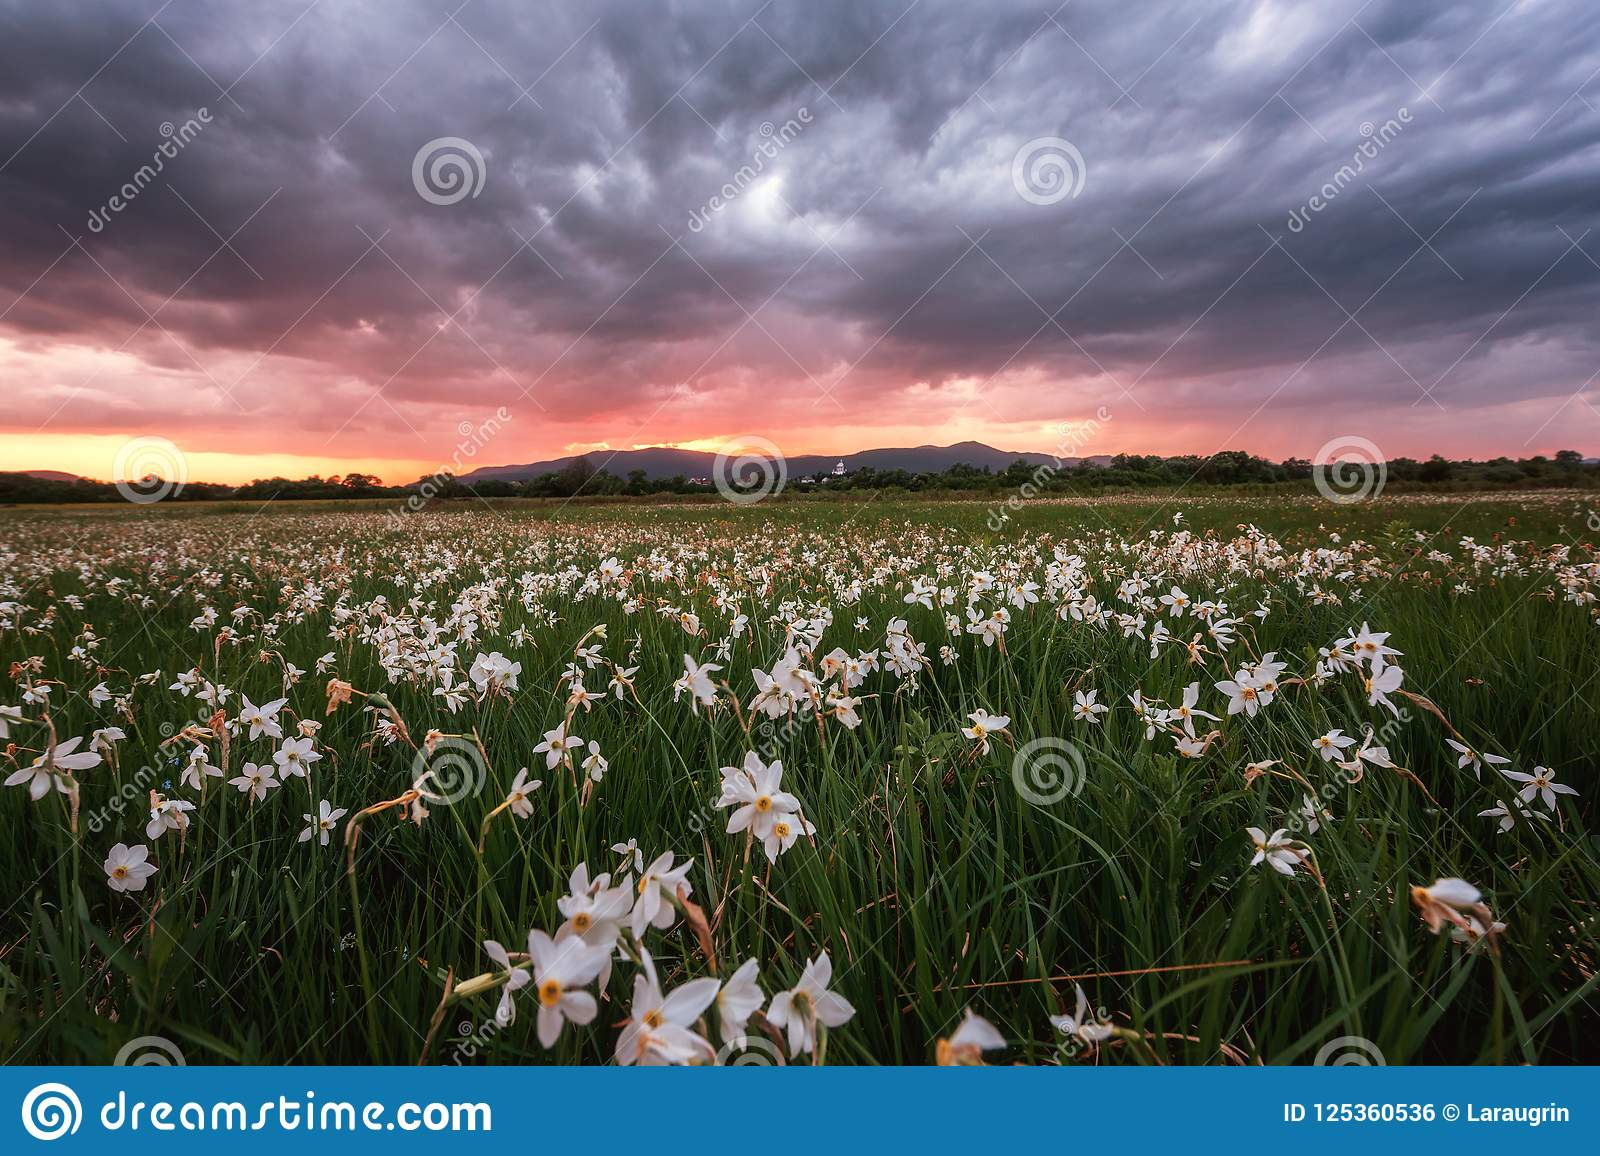 Photography scenery amazing sunset flower pretty picturesboss beautiful sunset flowering valley scenic landscape wild growing white flowers dramatic thunder beautiful image jpg 1600x1156 izmirmasajfo